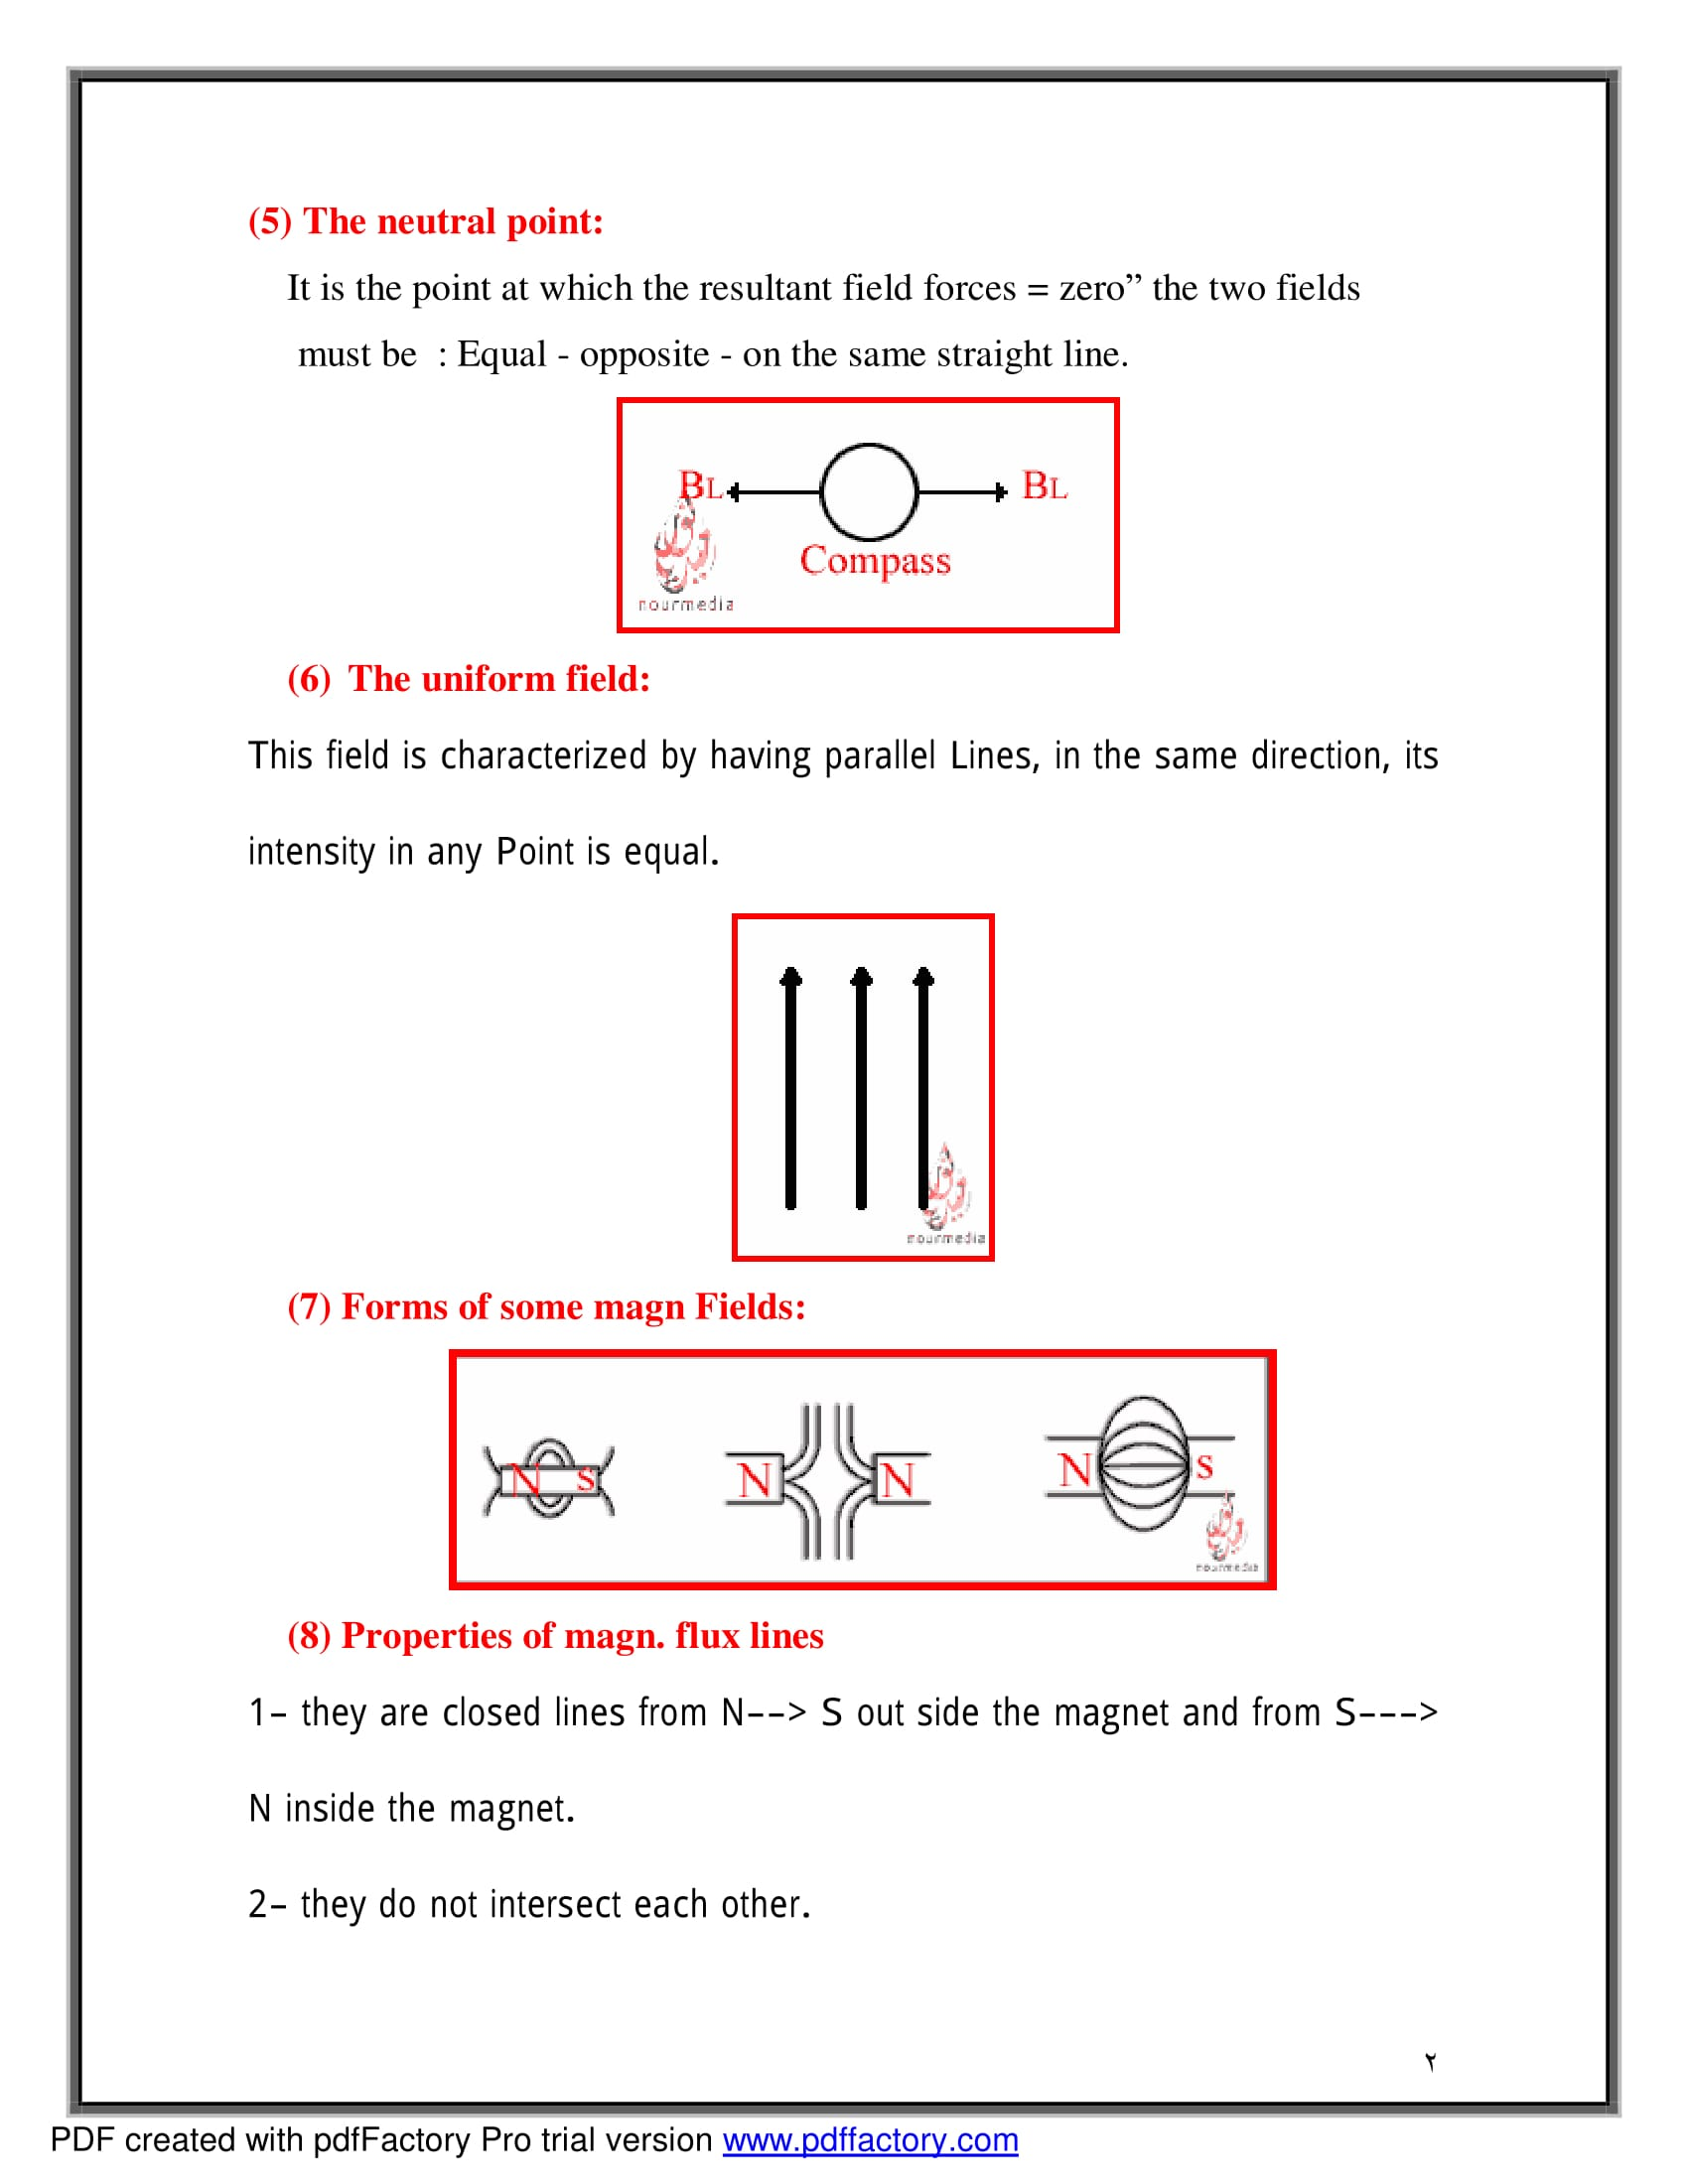 exam-eg.com_1512394488061.jpg